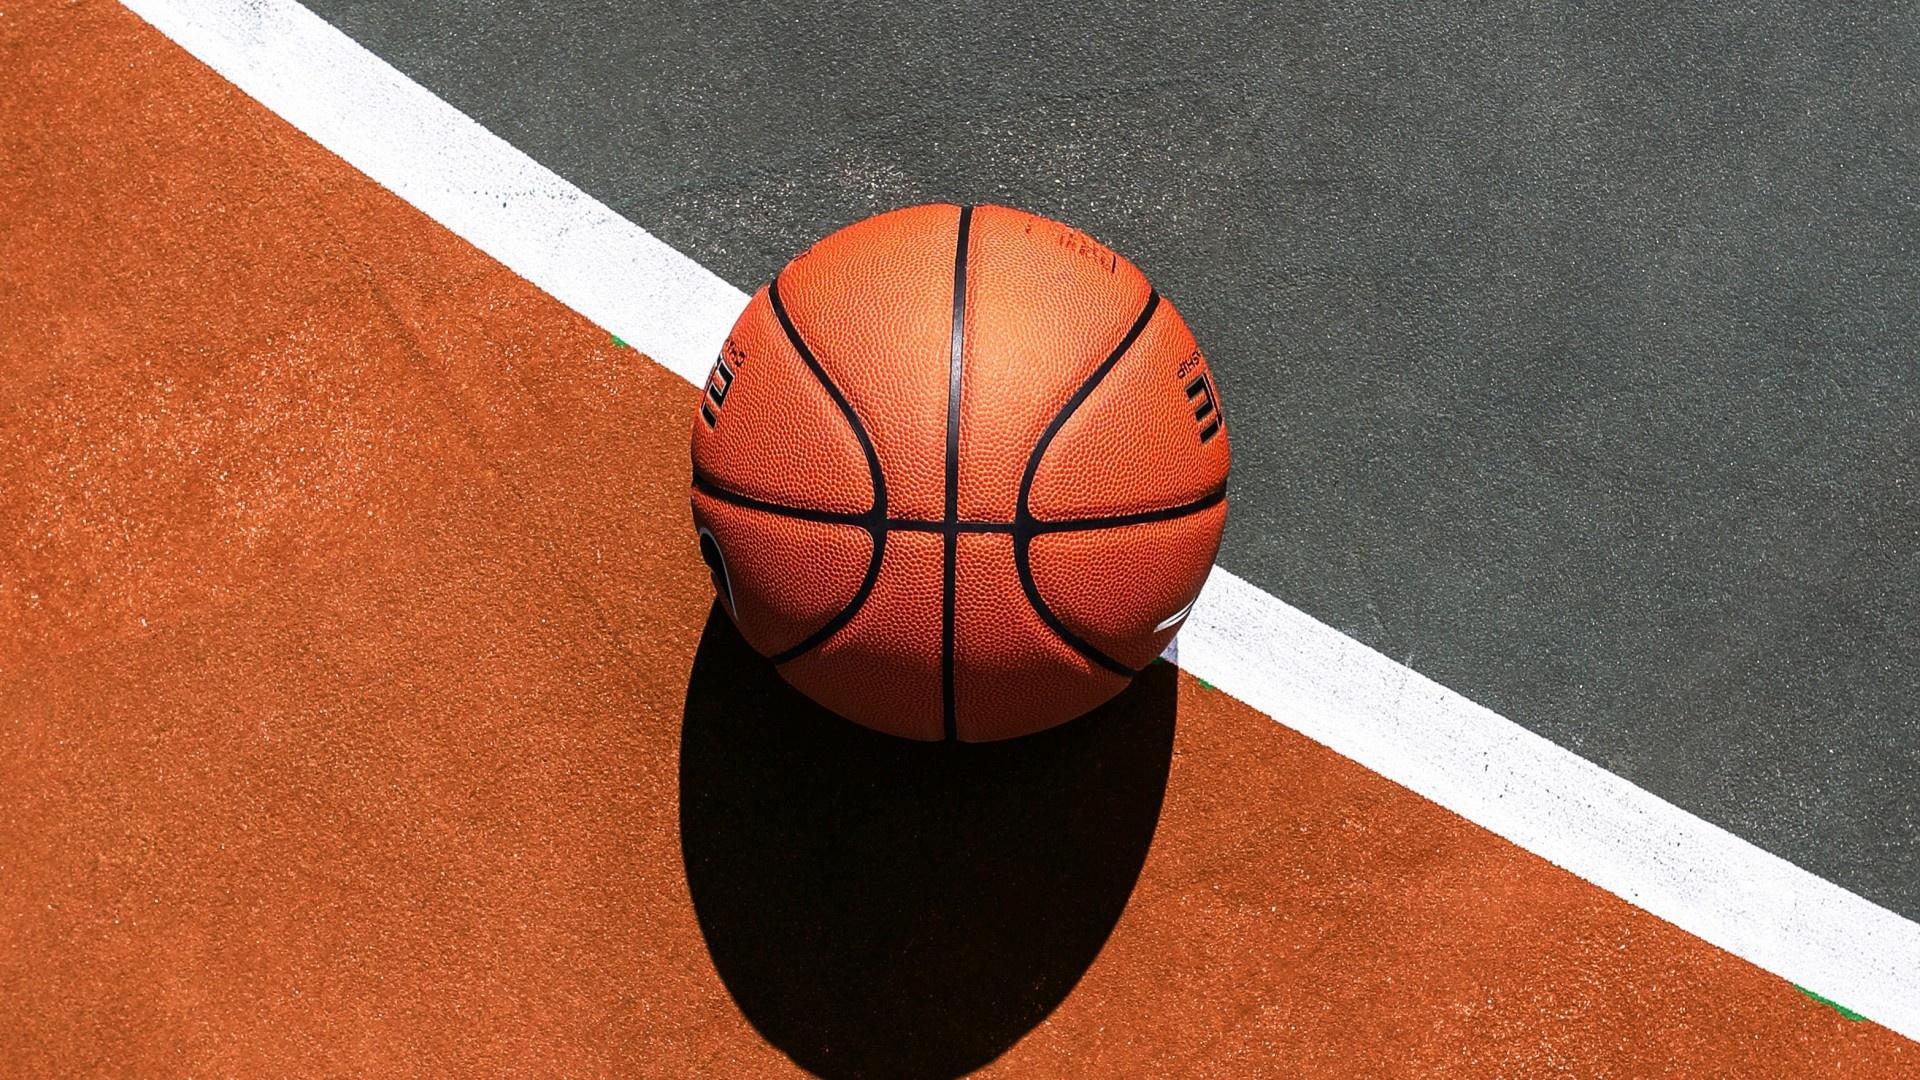 Basketball free photo